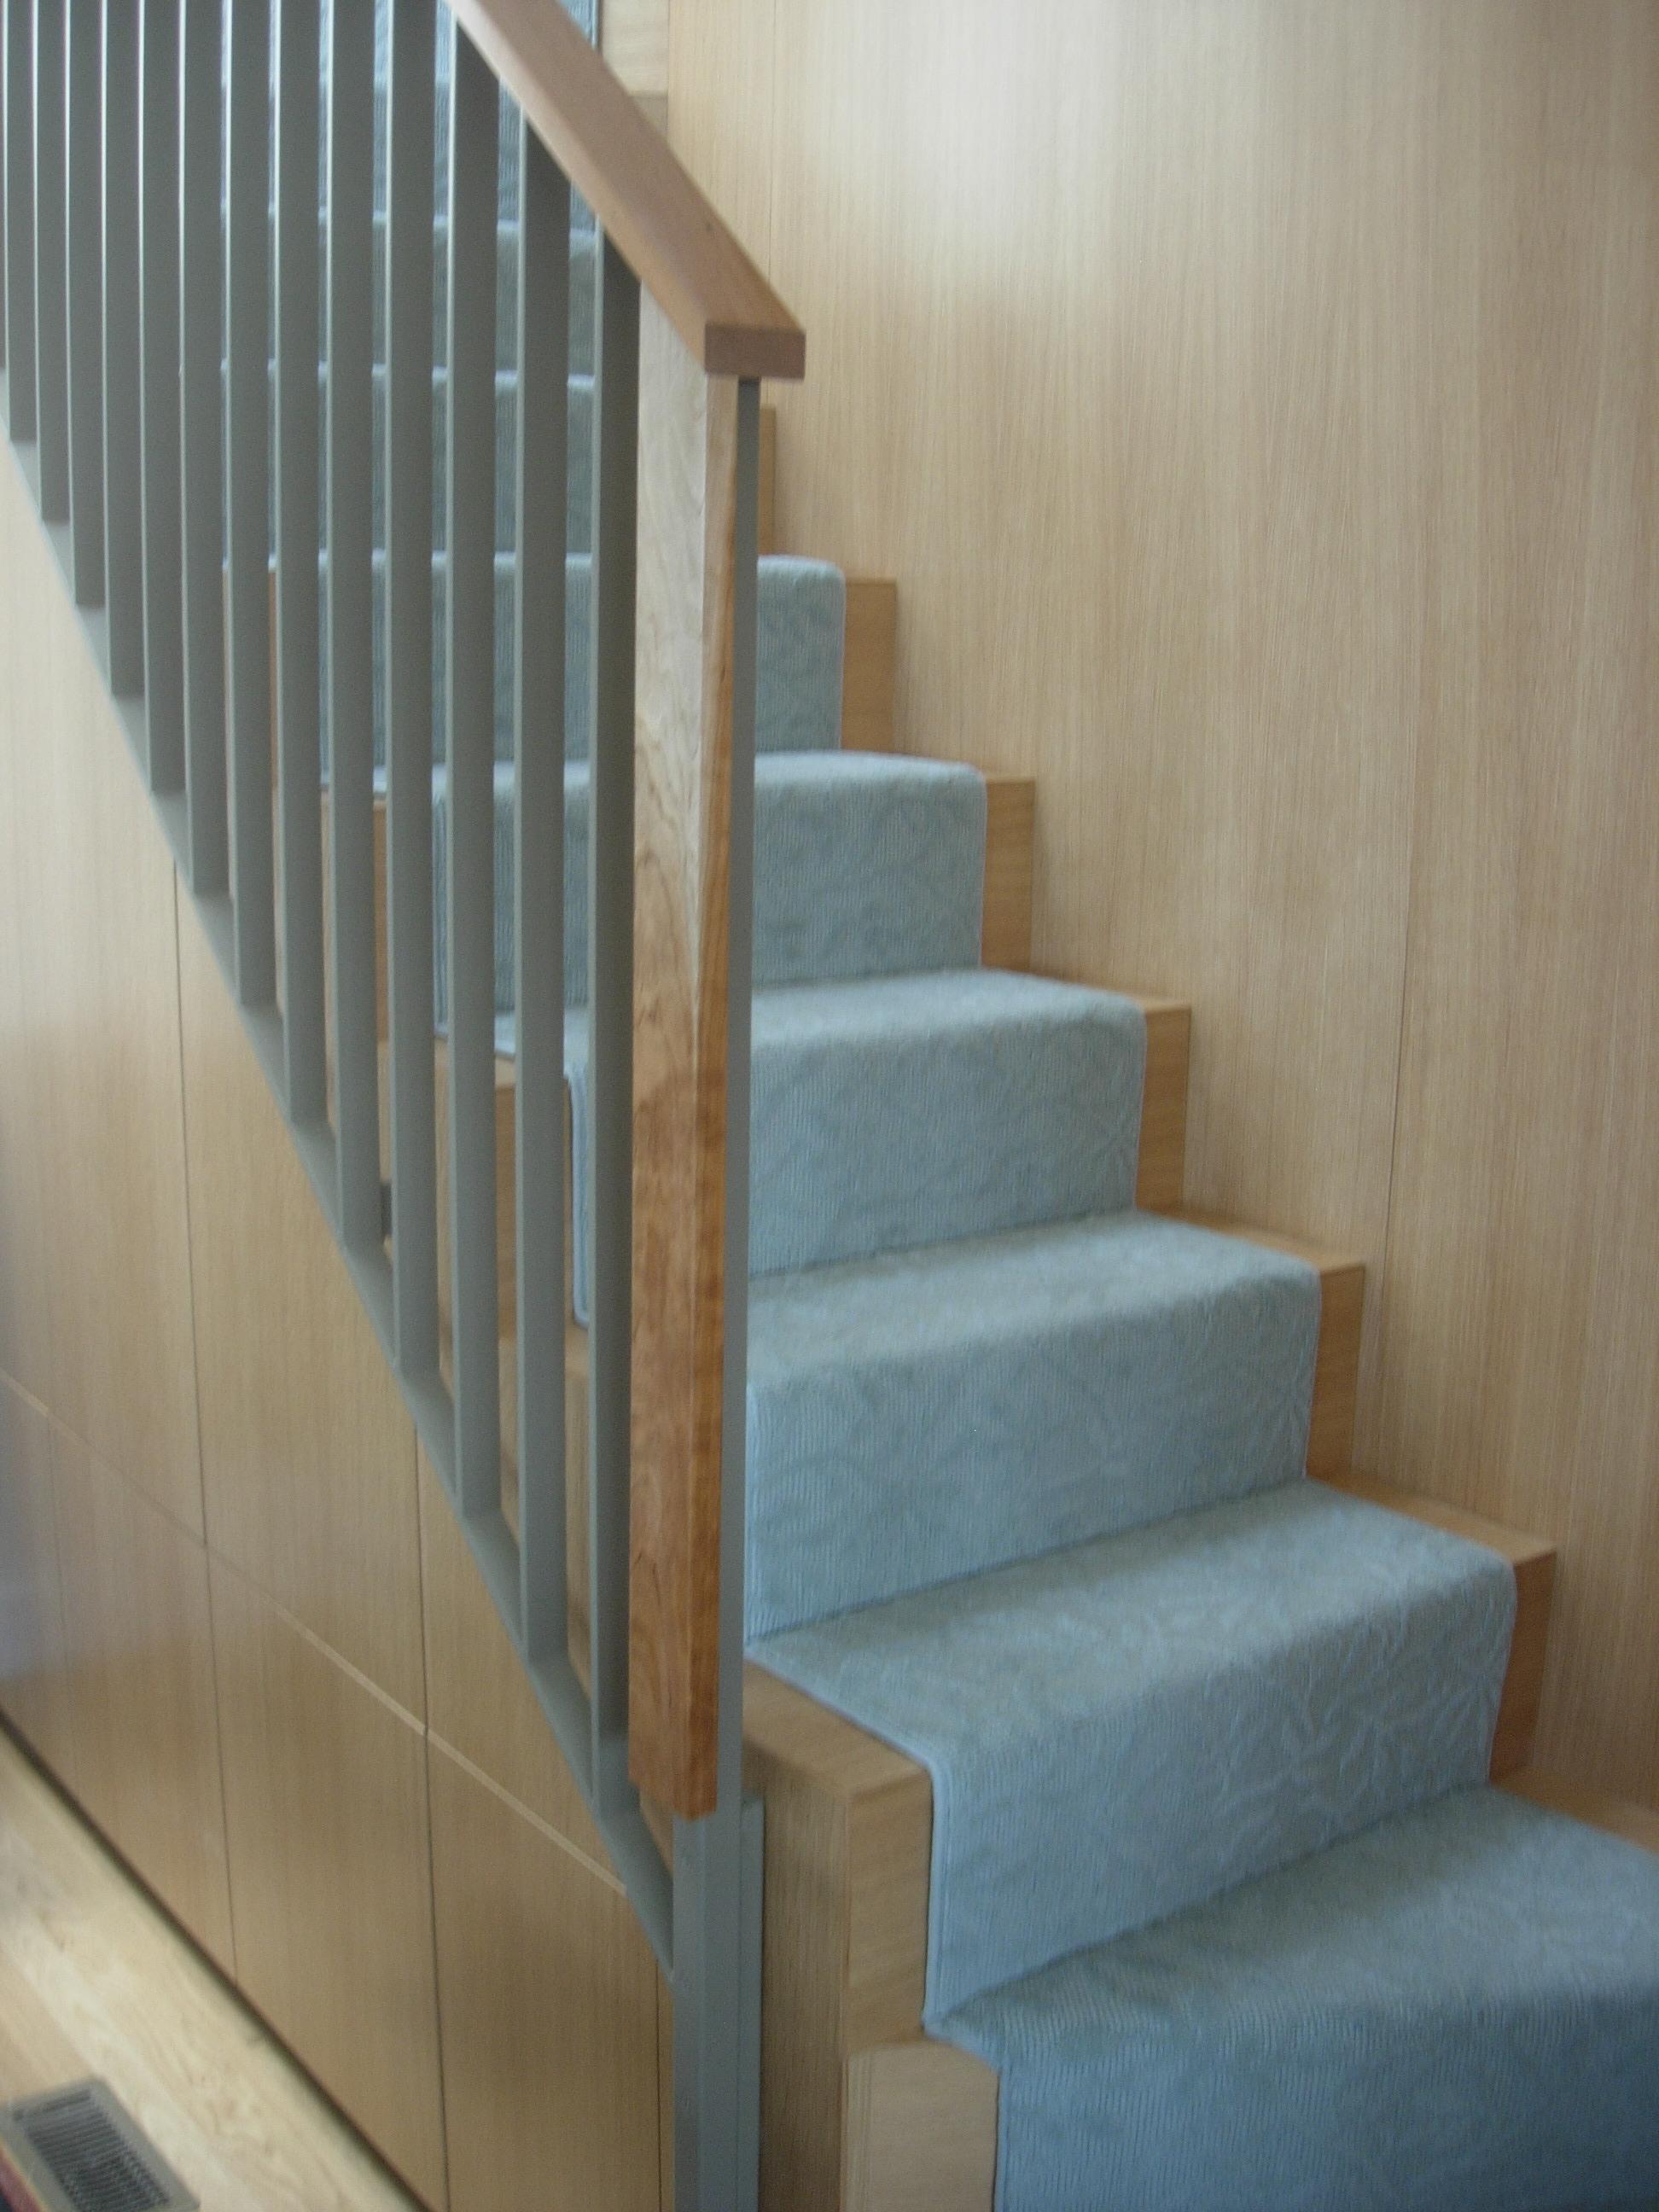 Loft stair railing